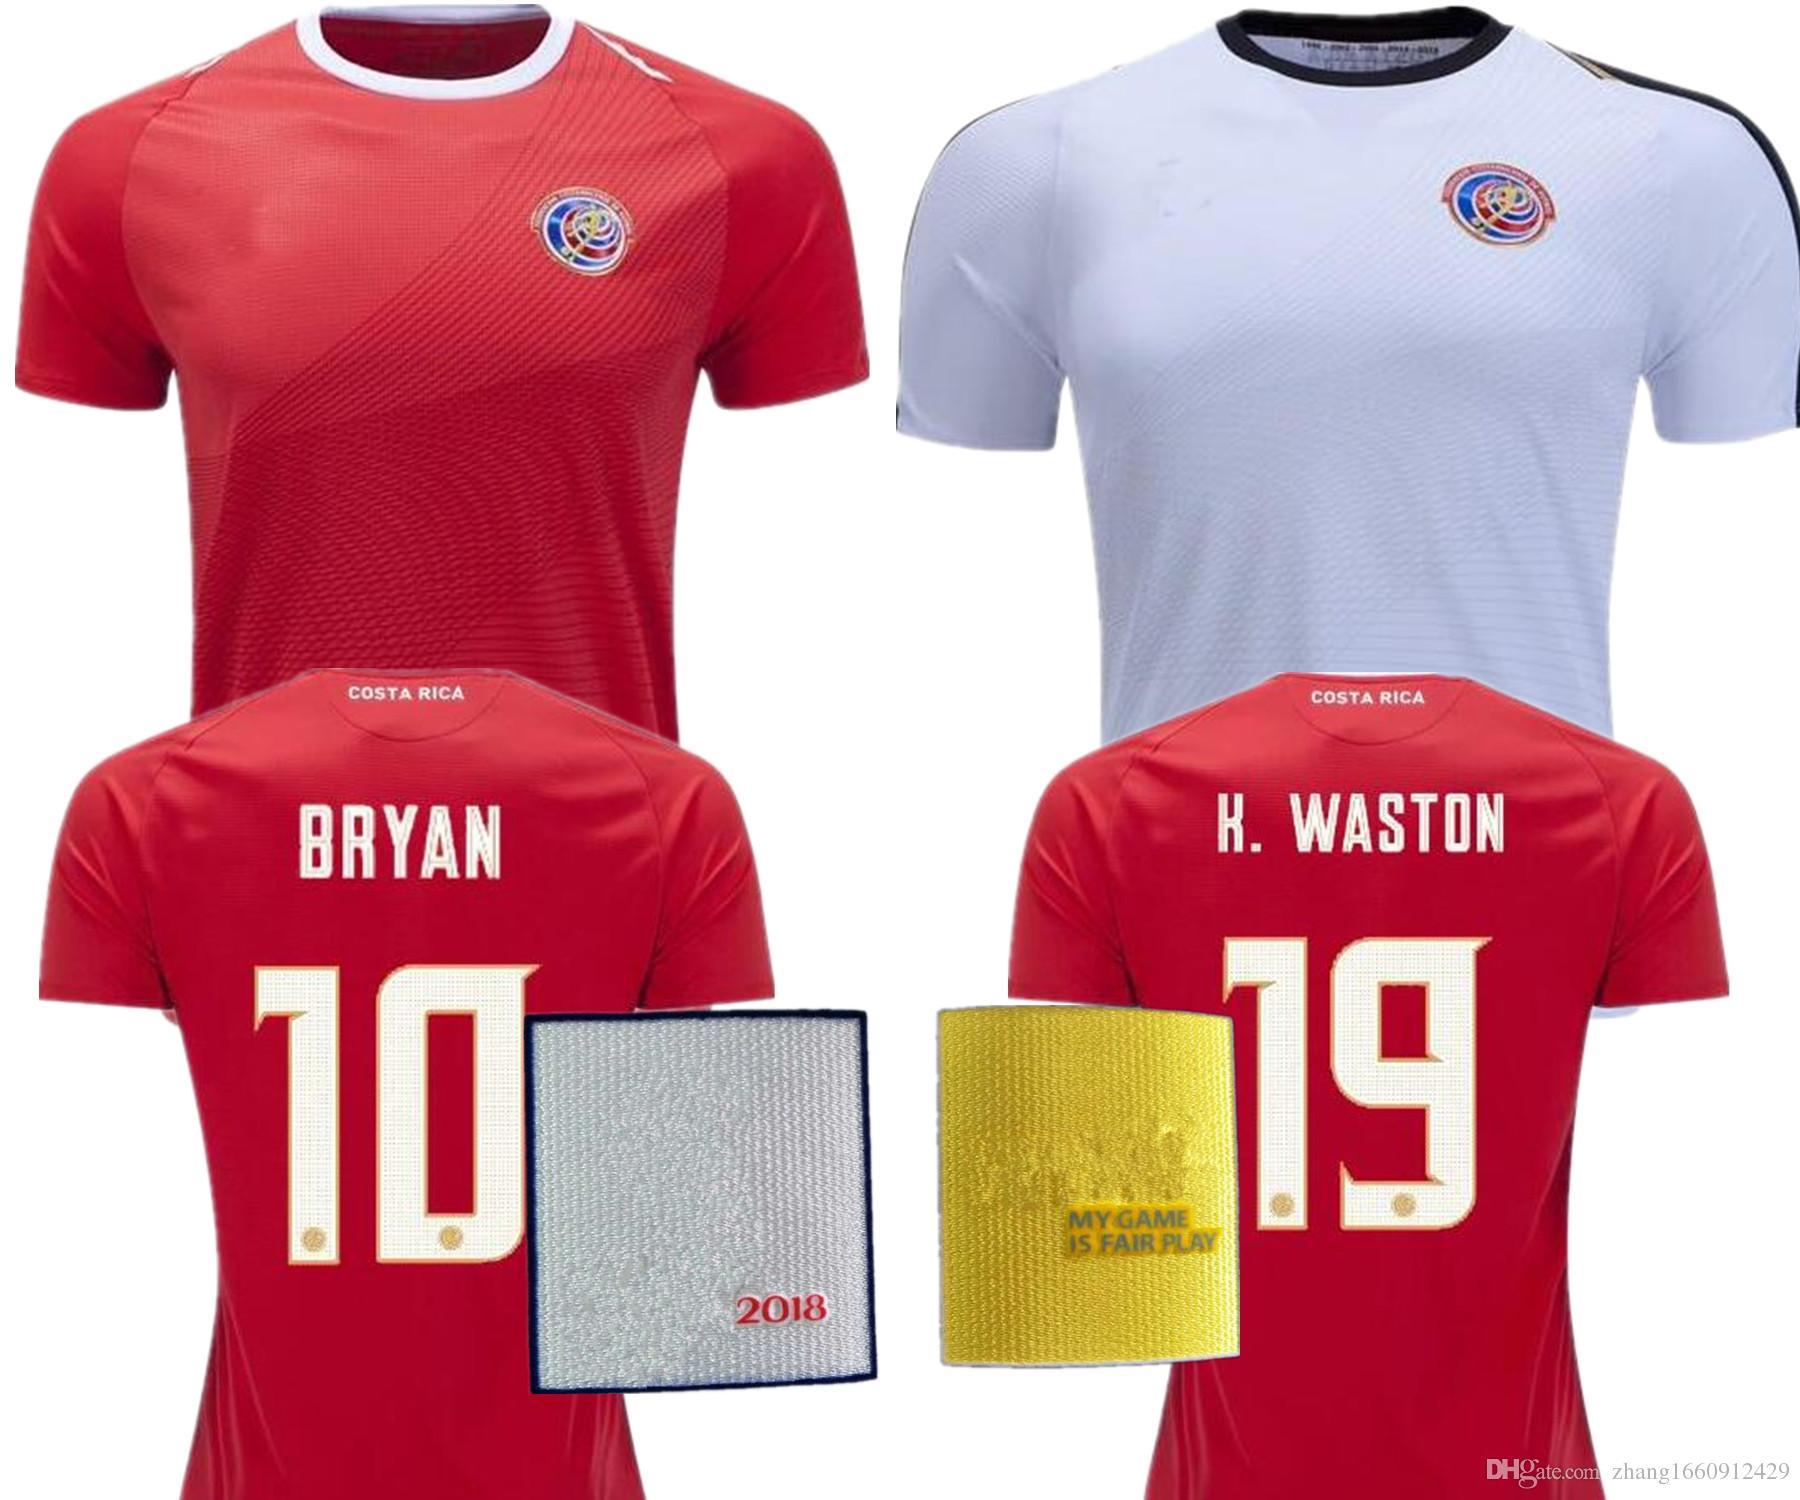 39e6cce81 2019 2018 Costa Rica Soccer Jersey 18 19 Costa Rica Home Away White Camisa  De Futebol JOEL CAMPBELL 2018 Football Shirt World Cup Maillot From ...